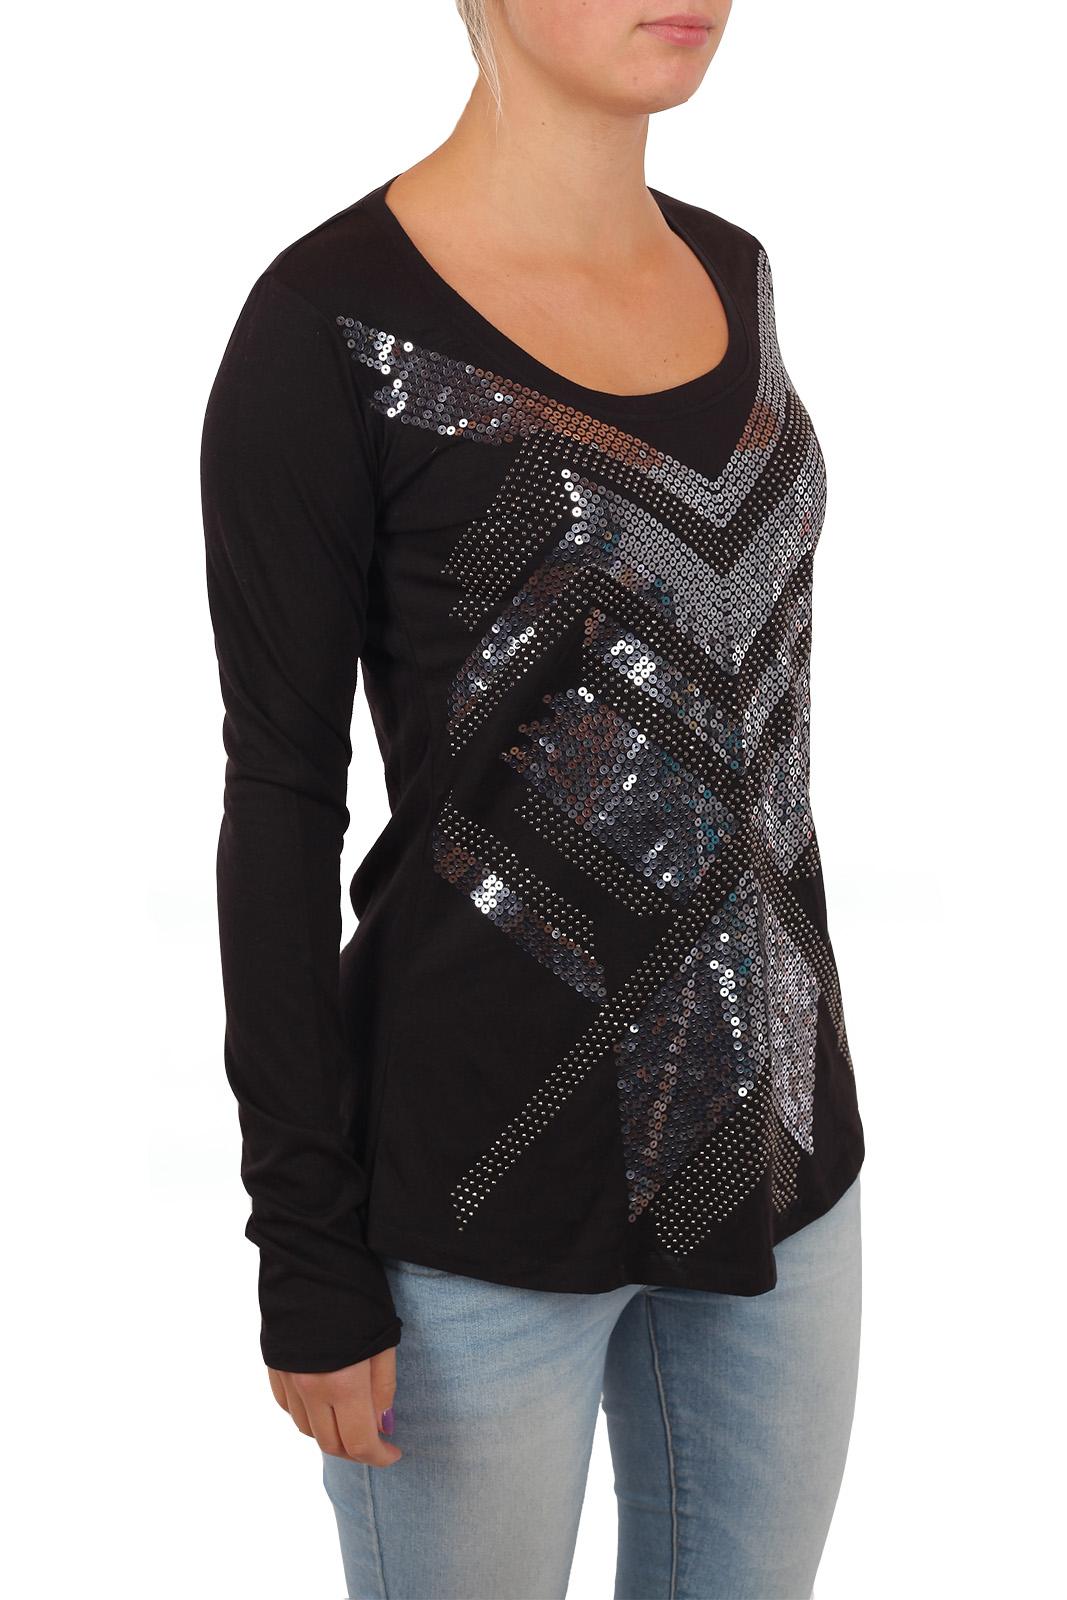 Роскошная чёрная туника с абстрактным орнаментом из пайеток. Правильная интерпретация стиля ГЛАМУР от бренда Rock and Roll Cowgirl